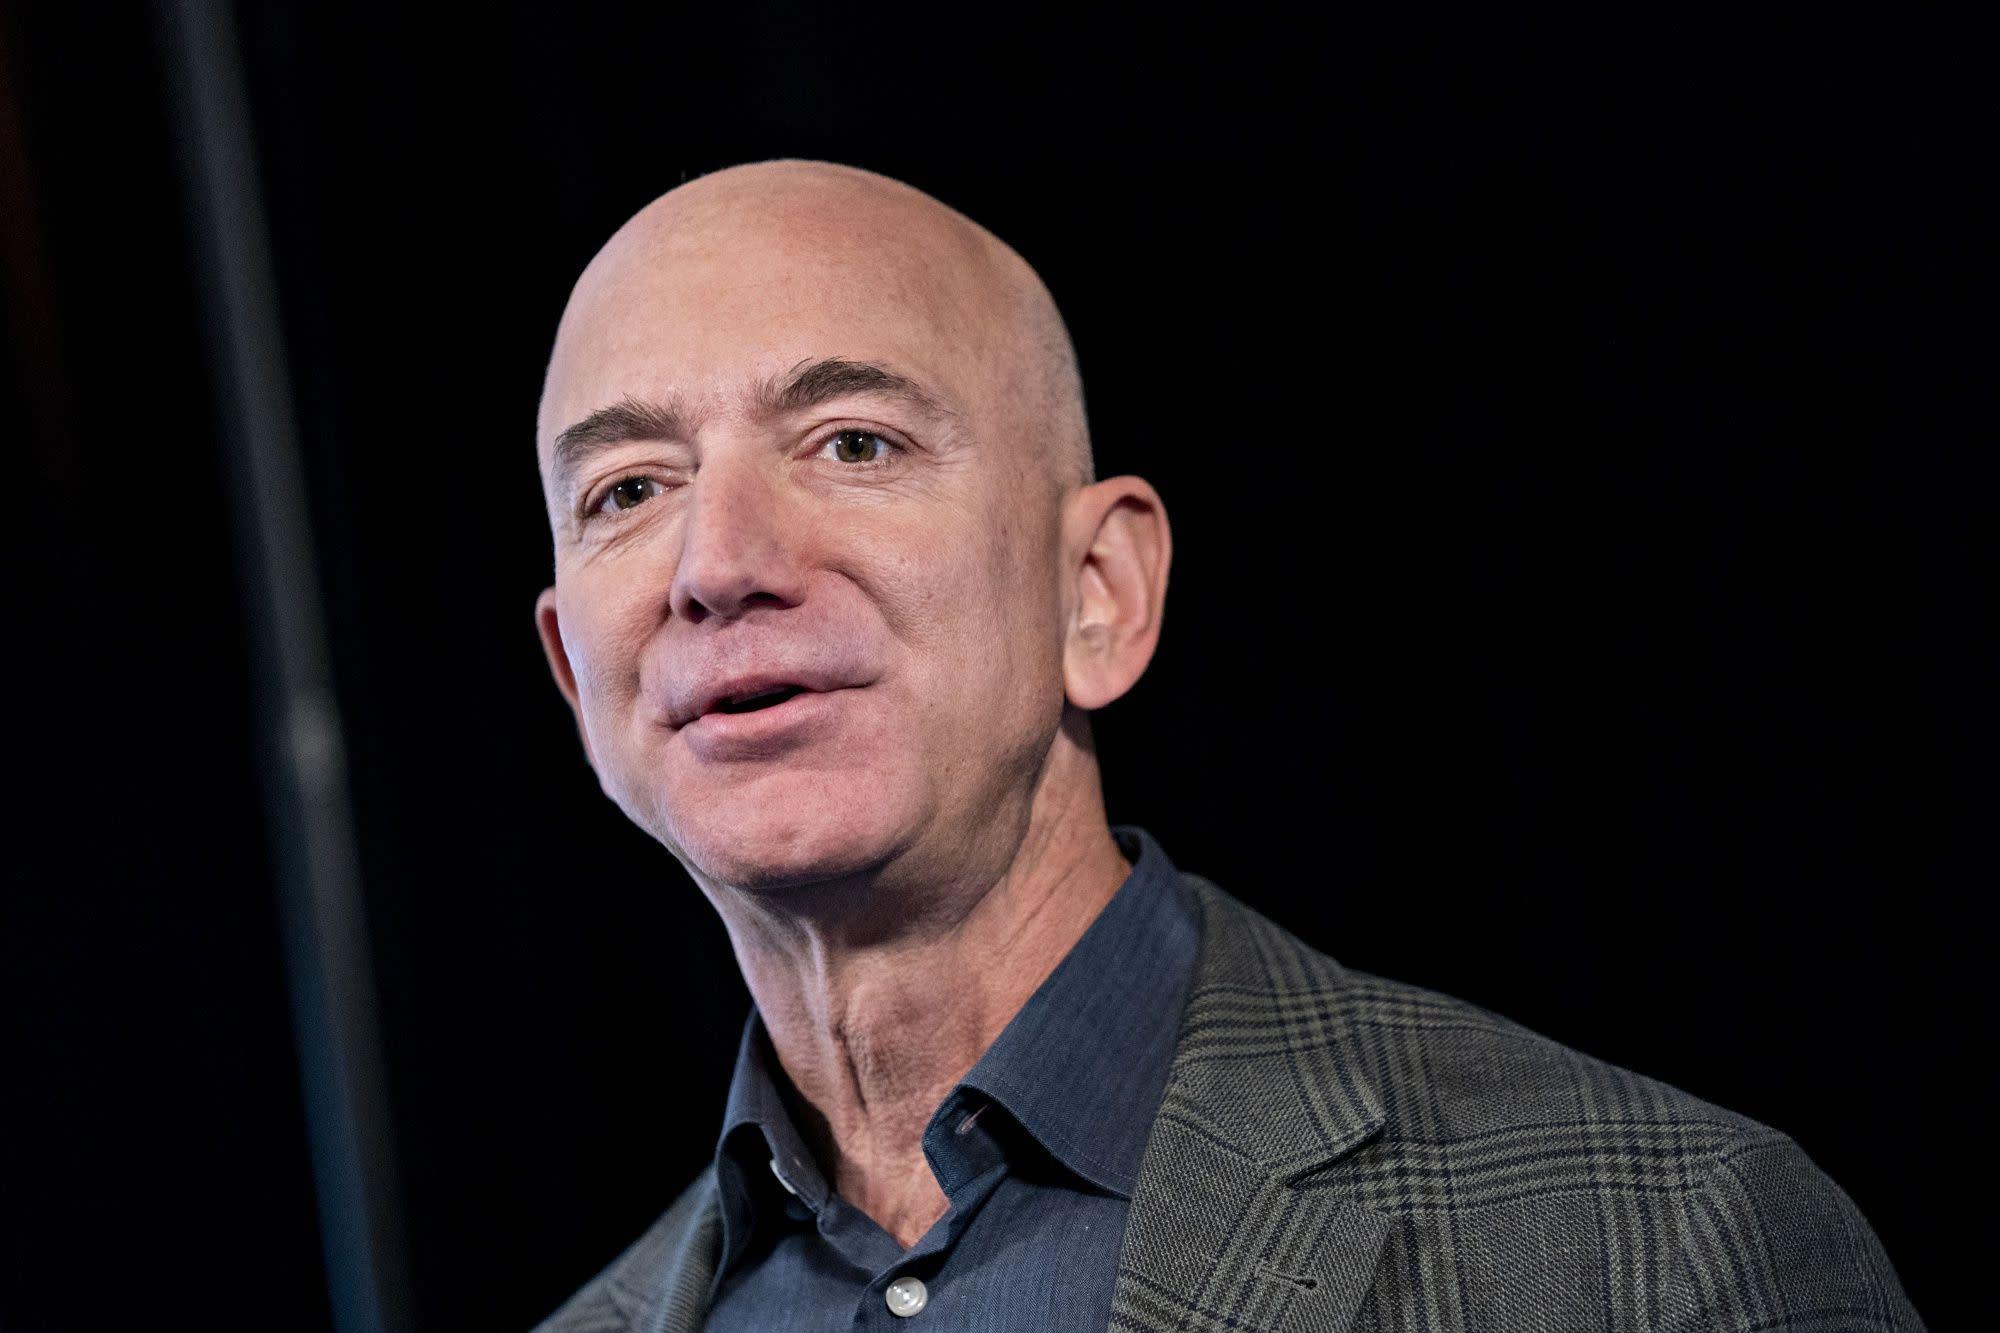 Bezos Sells $2.5 Billion of Amazon Stock, Signals More Coming